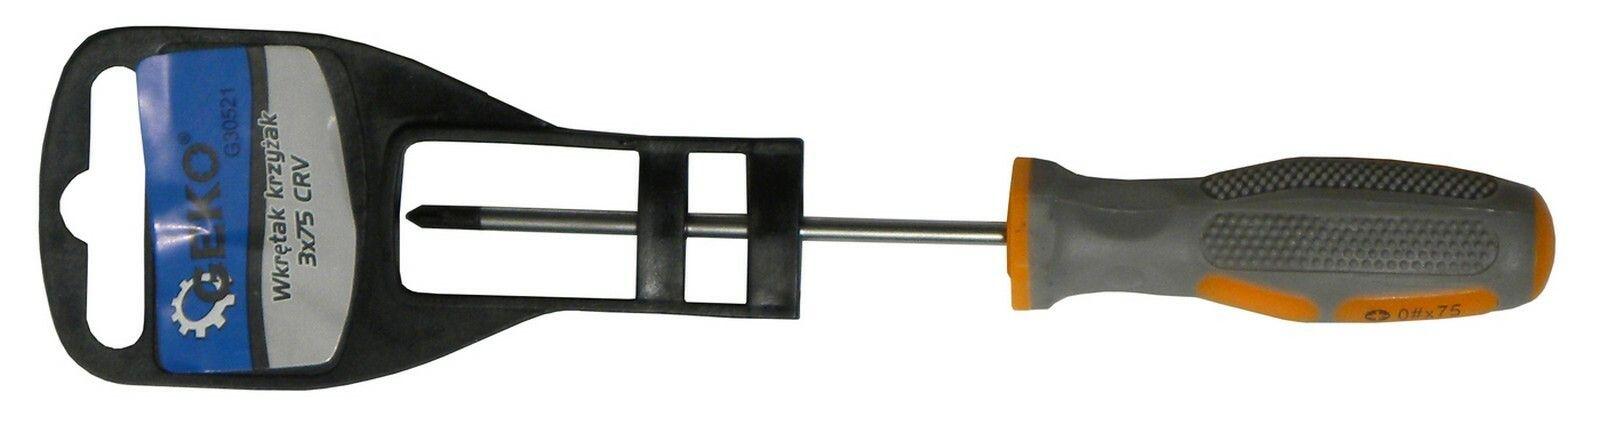 Šroubovák křížový, PH 3x75mm, CrV GEKO